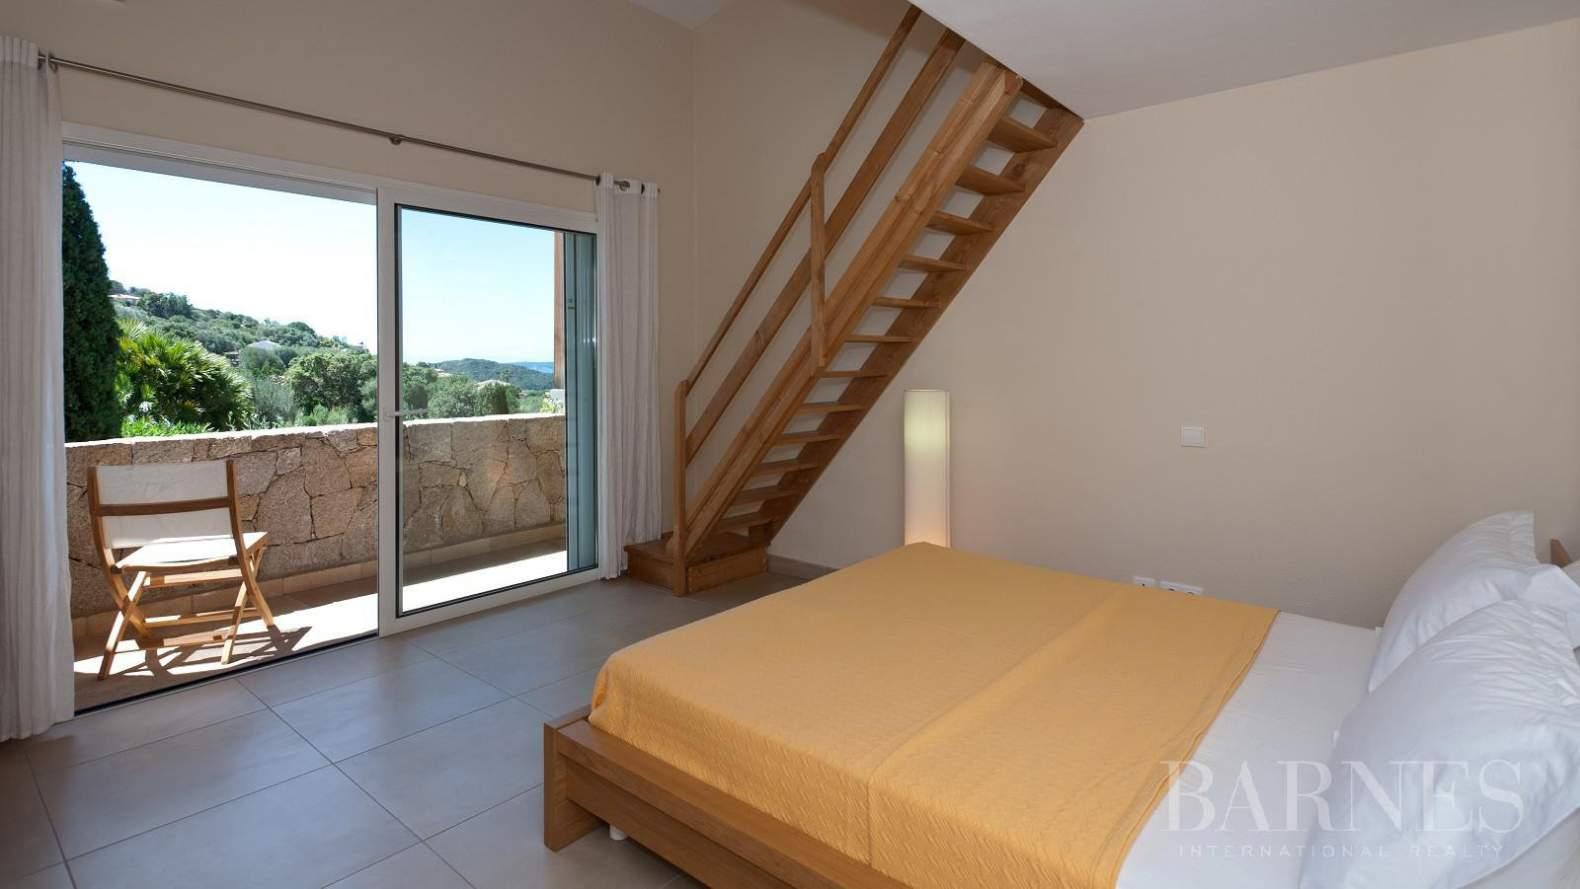 Sainte-Lucie-de-Porto-Vecchio  - Villa 7 Pièces 5 Chambres - picture 15